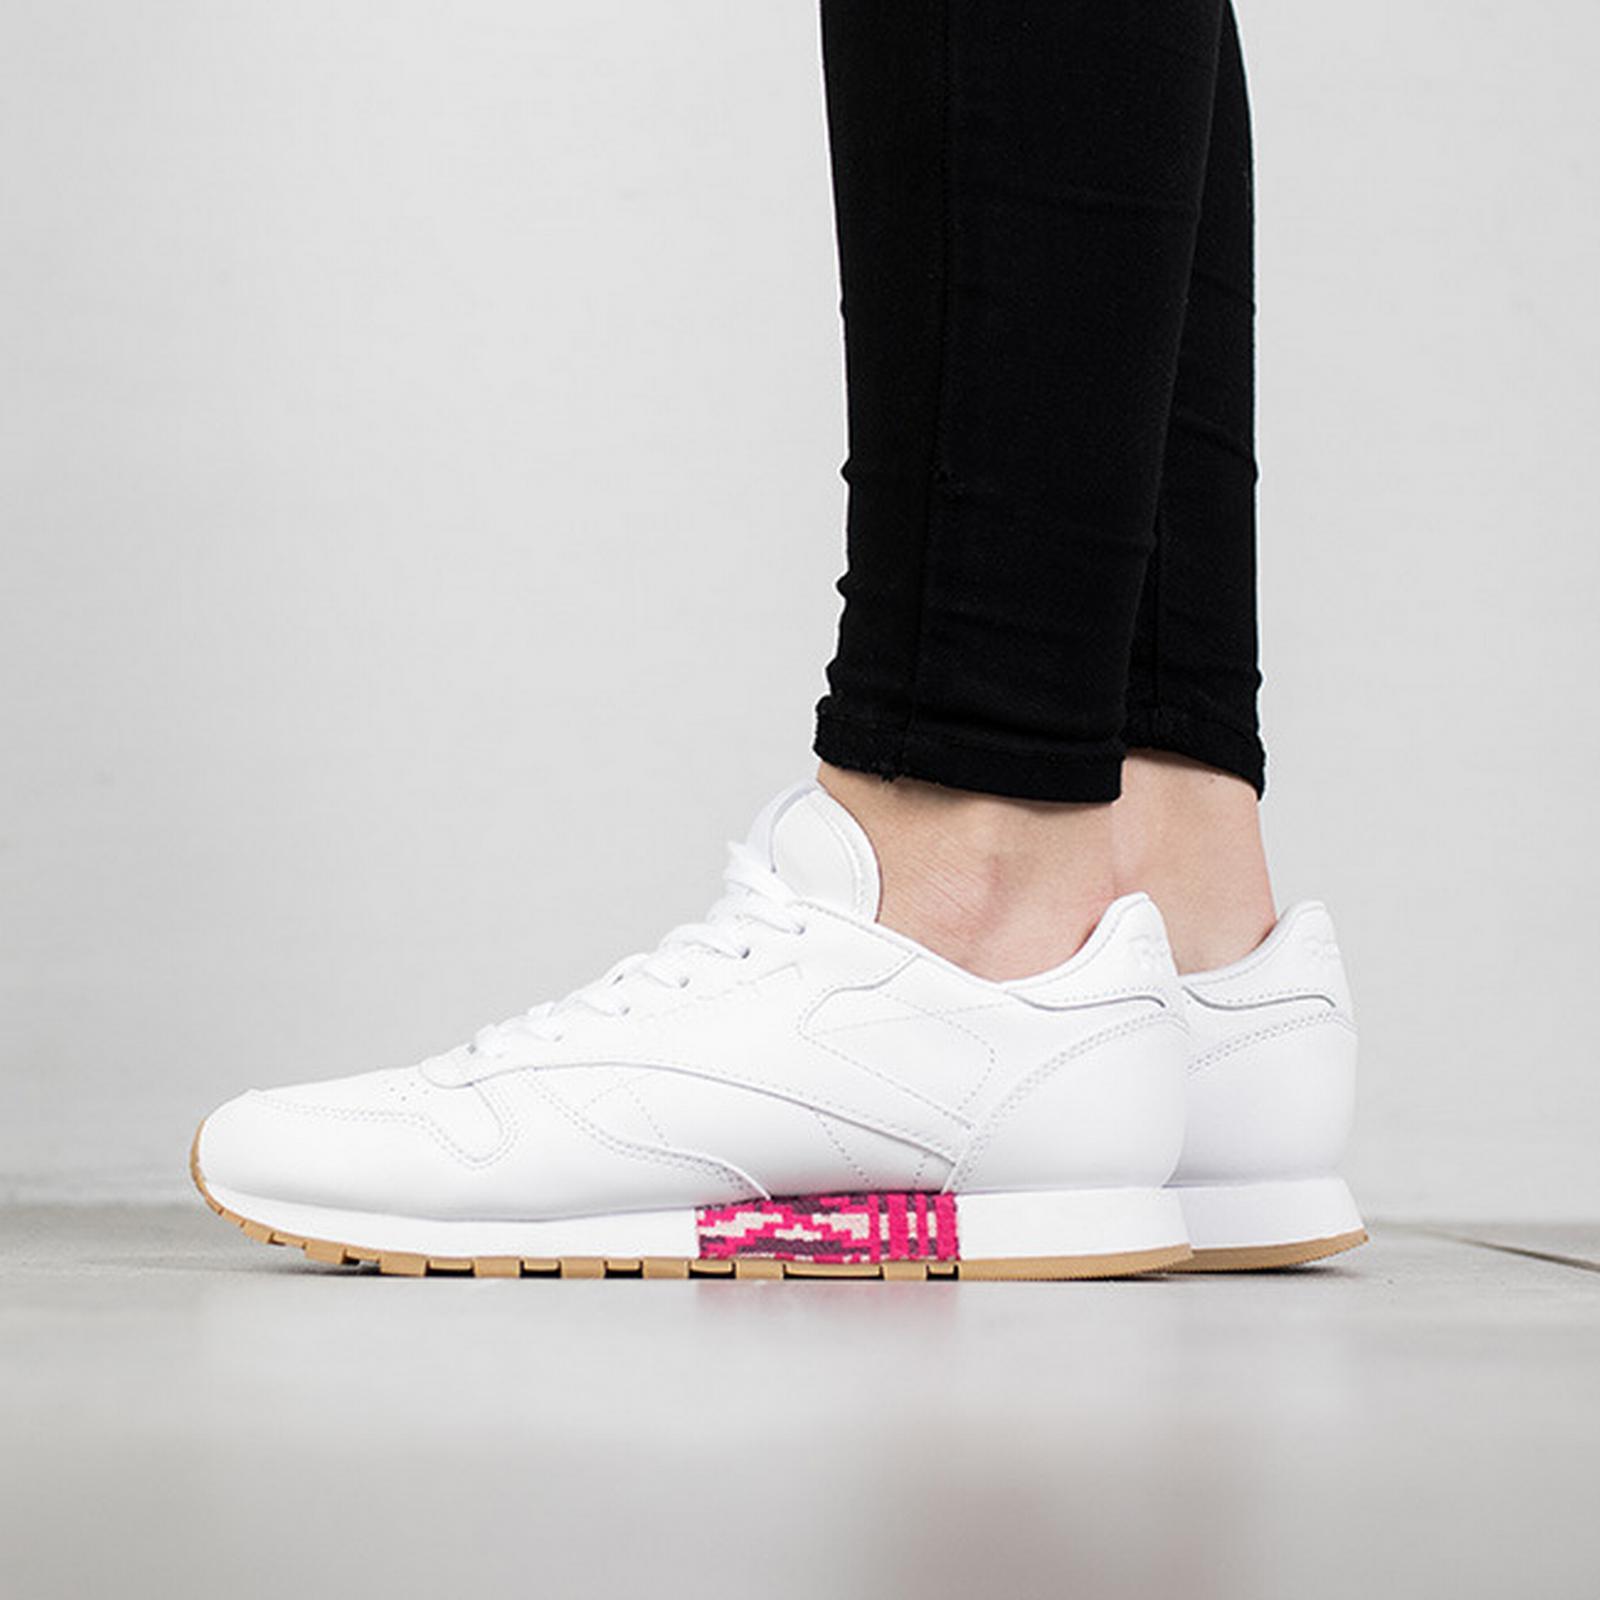 Reebok Classic Classic Women's Shoes sneakers Reebok Classic Classic Leather Old Meets BD3156 WHITE Size 40 4befa8